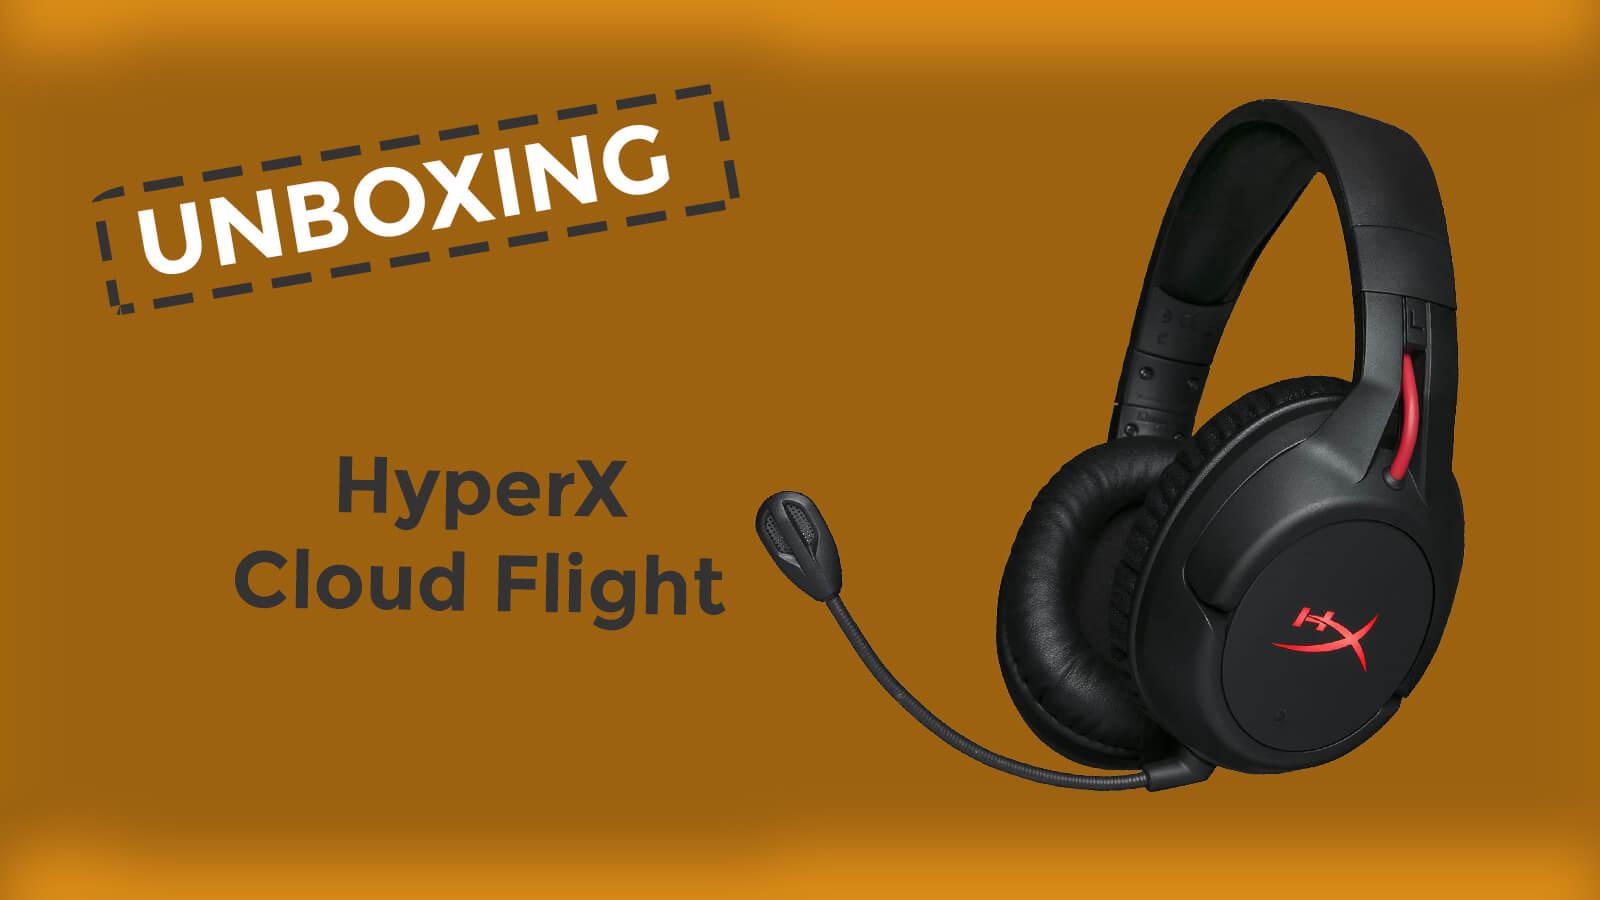 Unboxing HyperX Cloud Flight